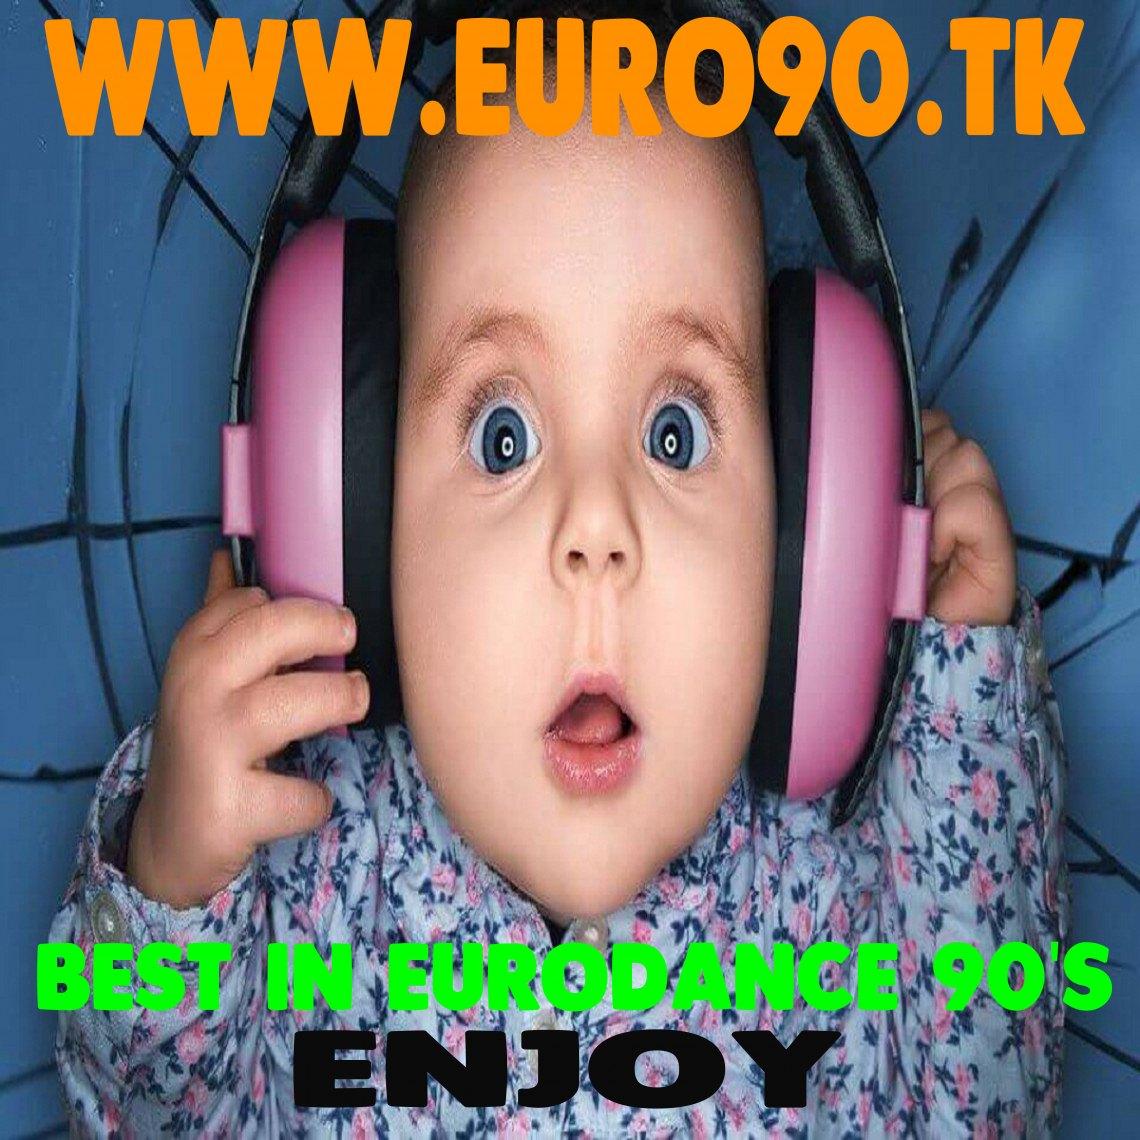 radio Euro 90 - Dance 90 Brazylia, Rio de Janeiro